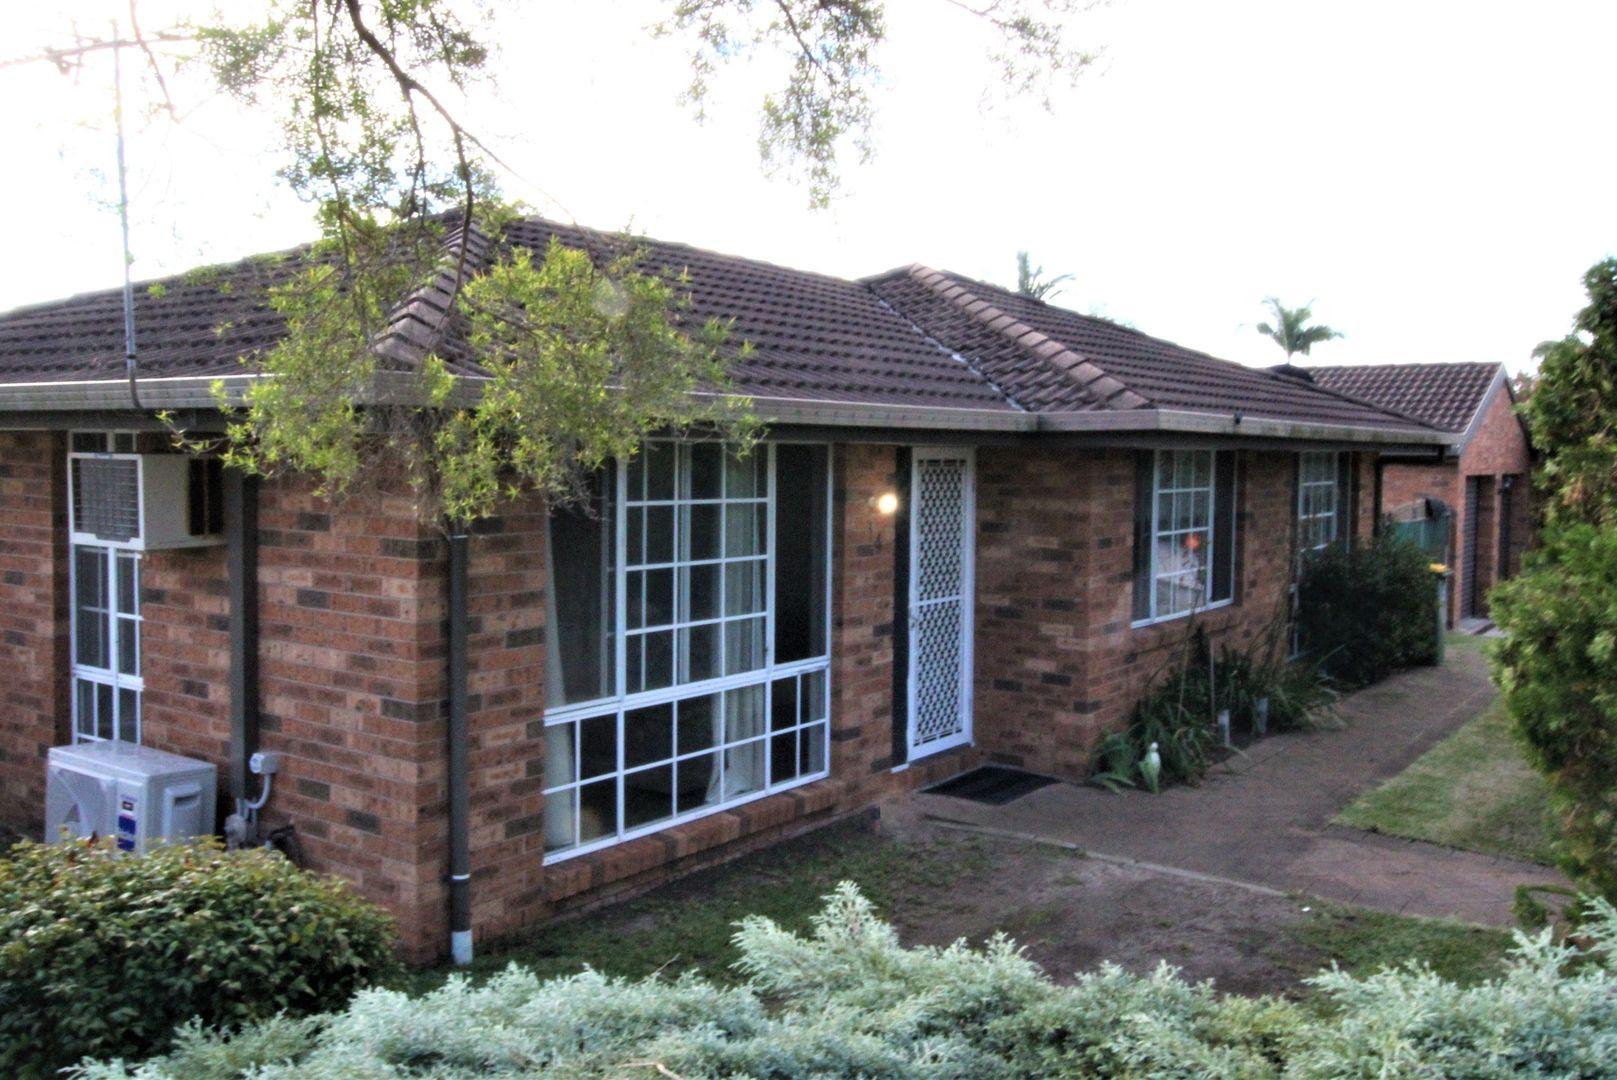 14 Valerie Court, Elermore Vale NSW 2287, Image 0